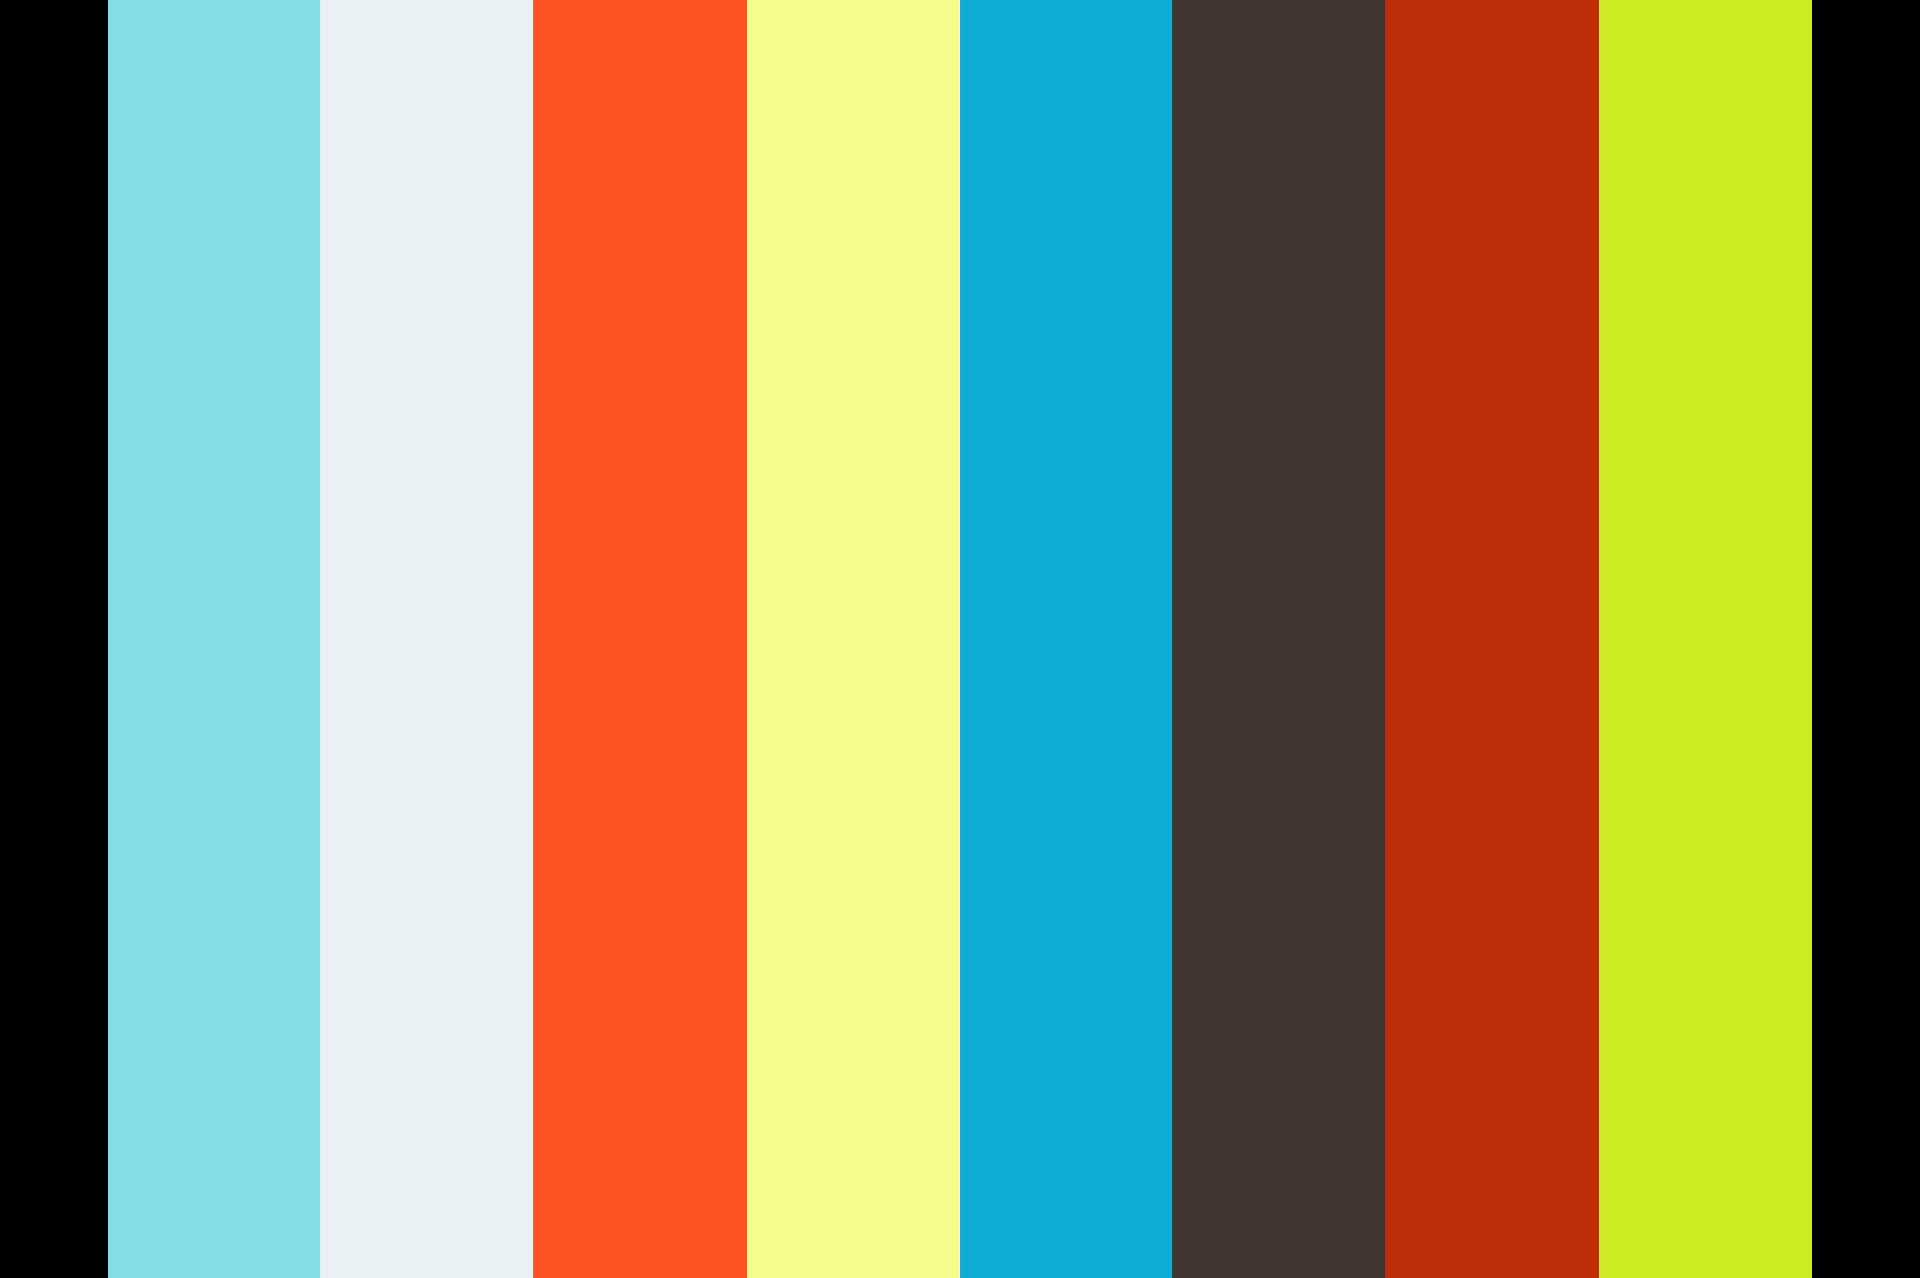 fallback-no-image-2129